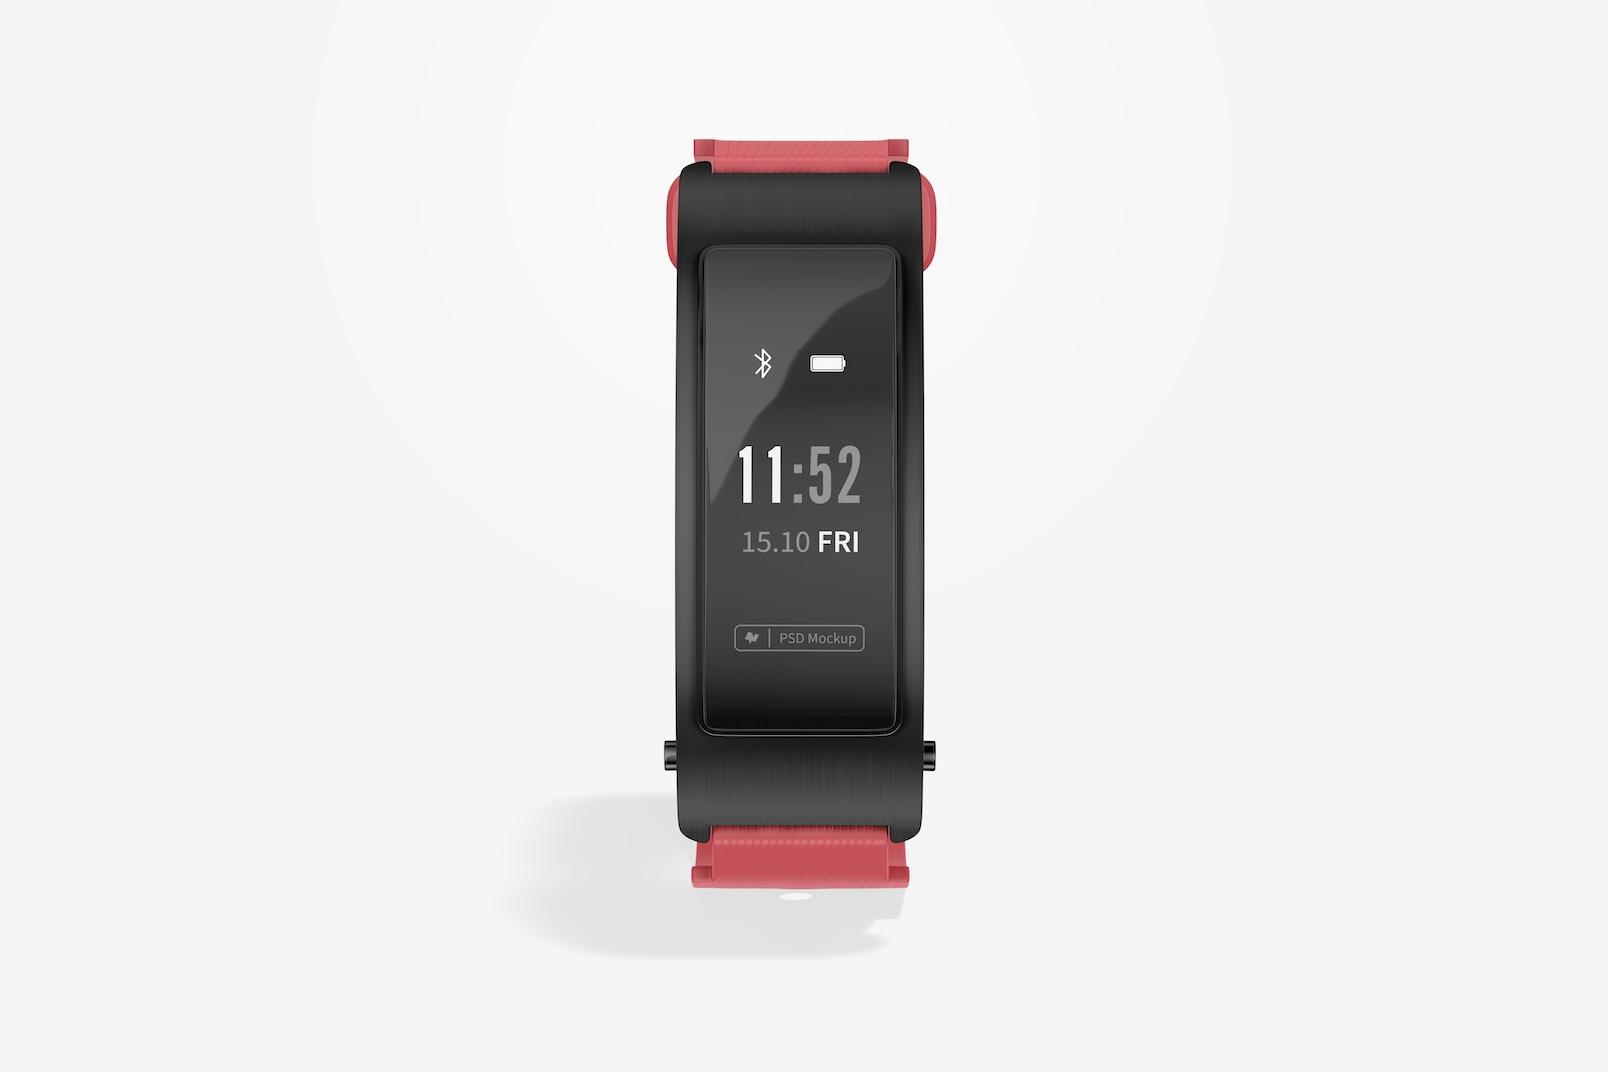 Huawei TalkBand B3 Smartwatch Mockup, Front View